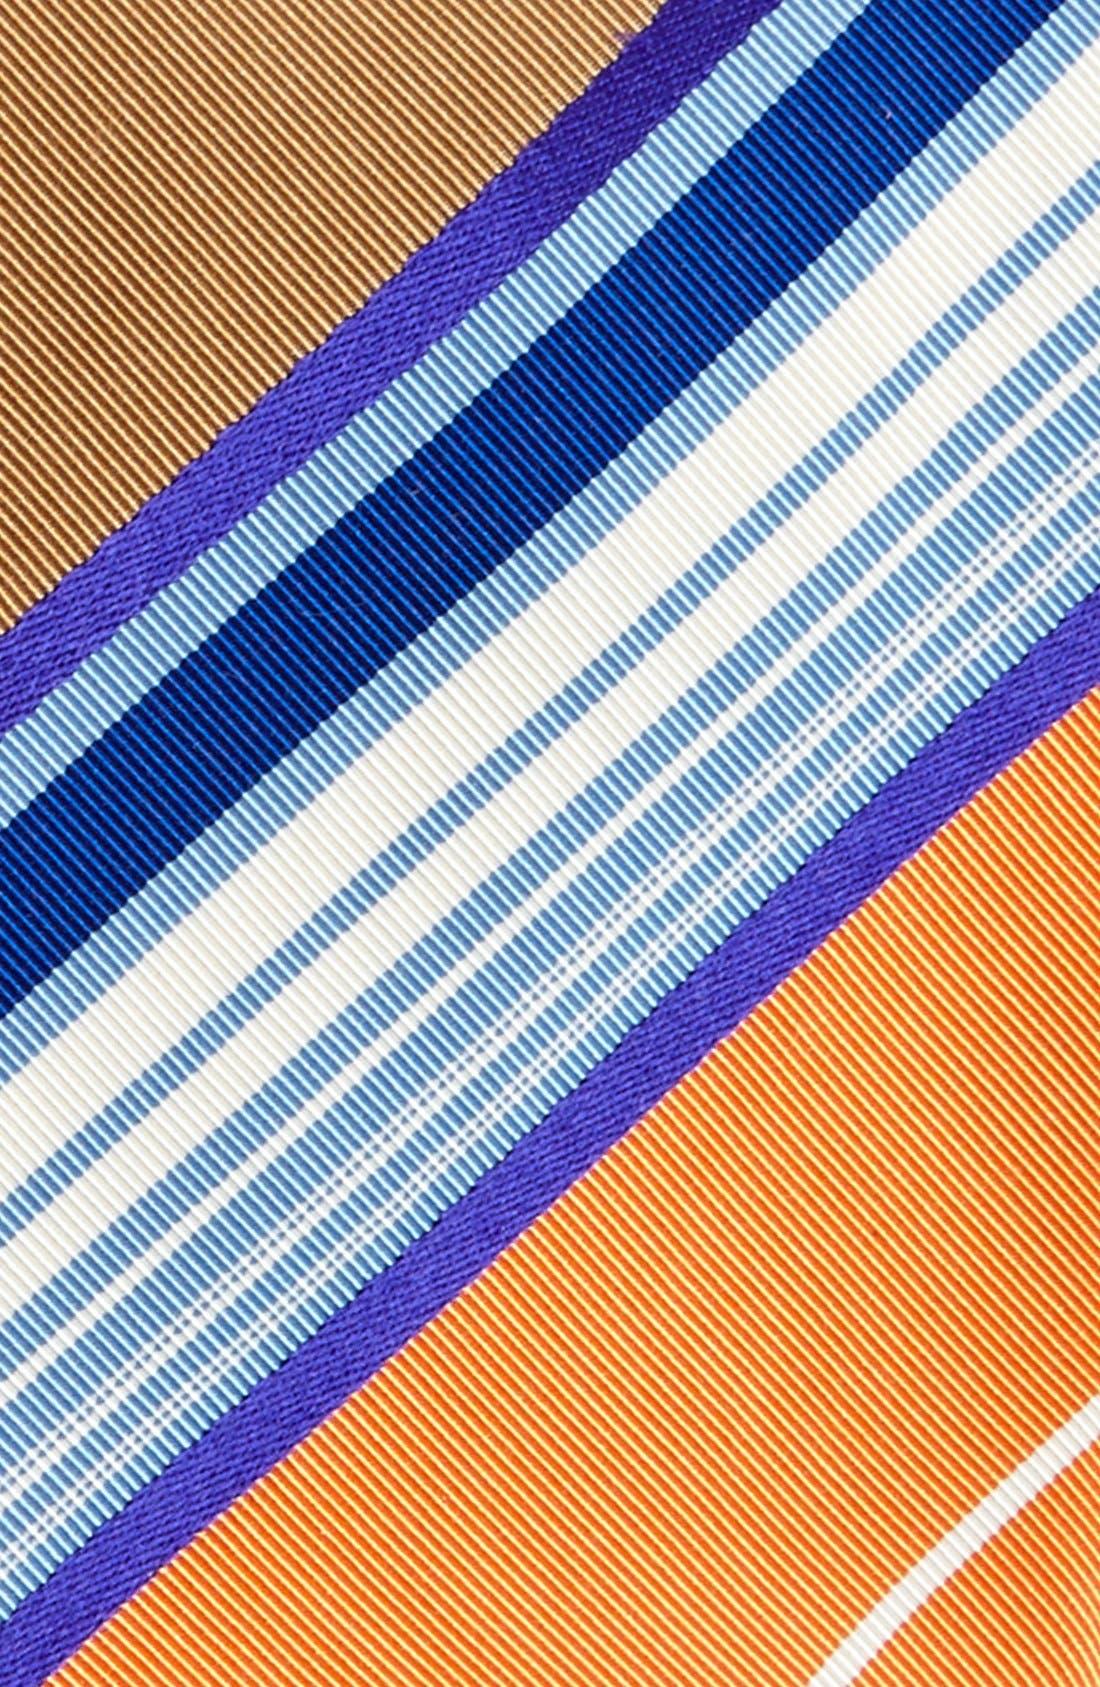 Alternate Image 2  - Etro Woven Silk & Cotton Tie